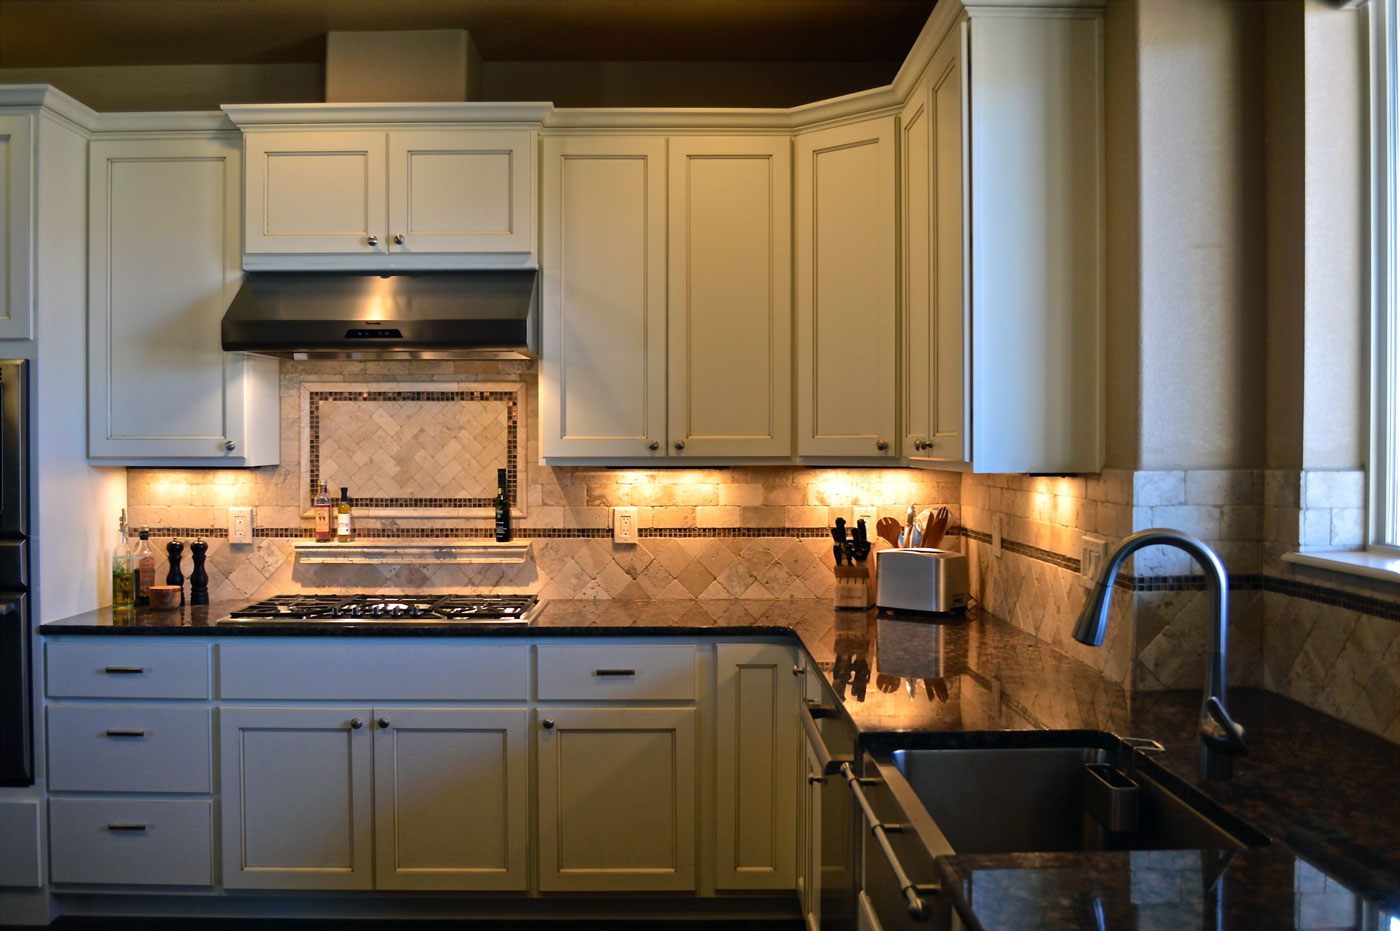 Tile Colorado Springs Custom And Model Home Interior Design And - Kitchen remodel colorado springs